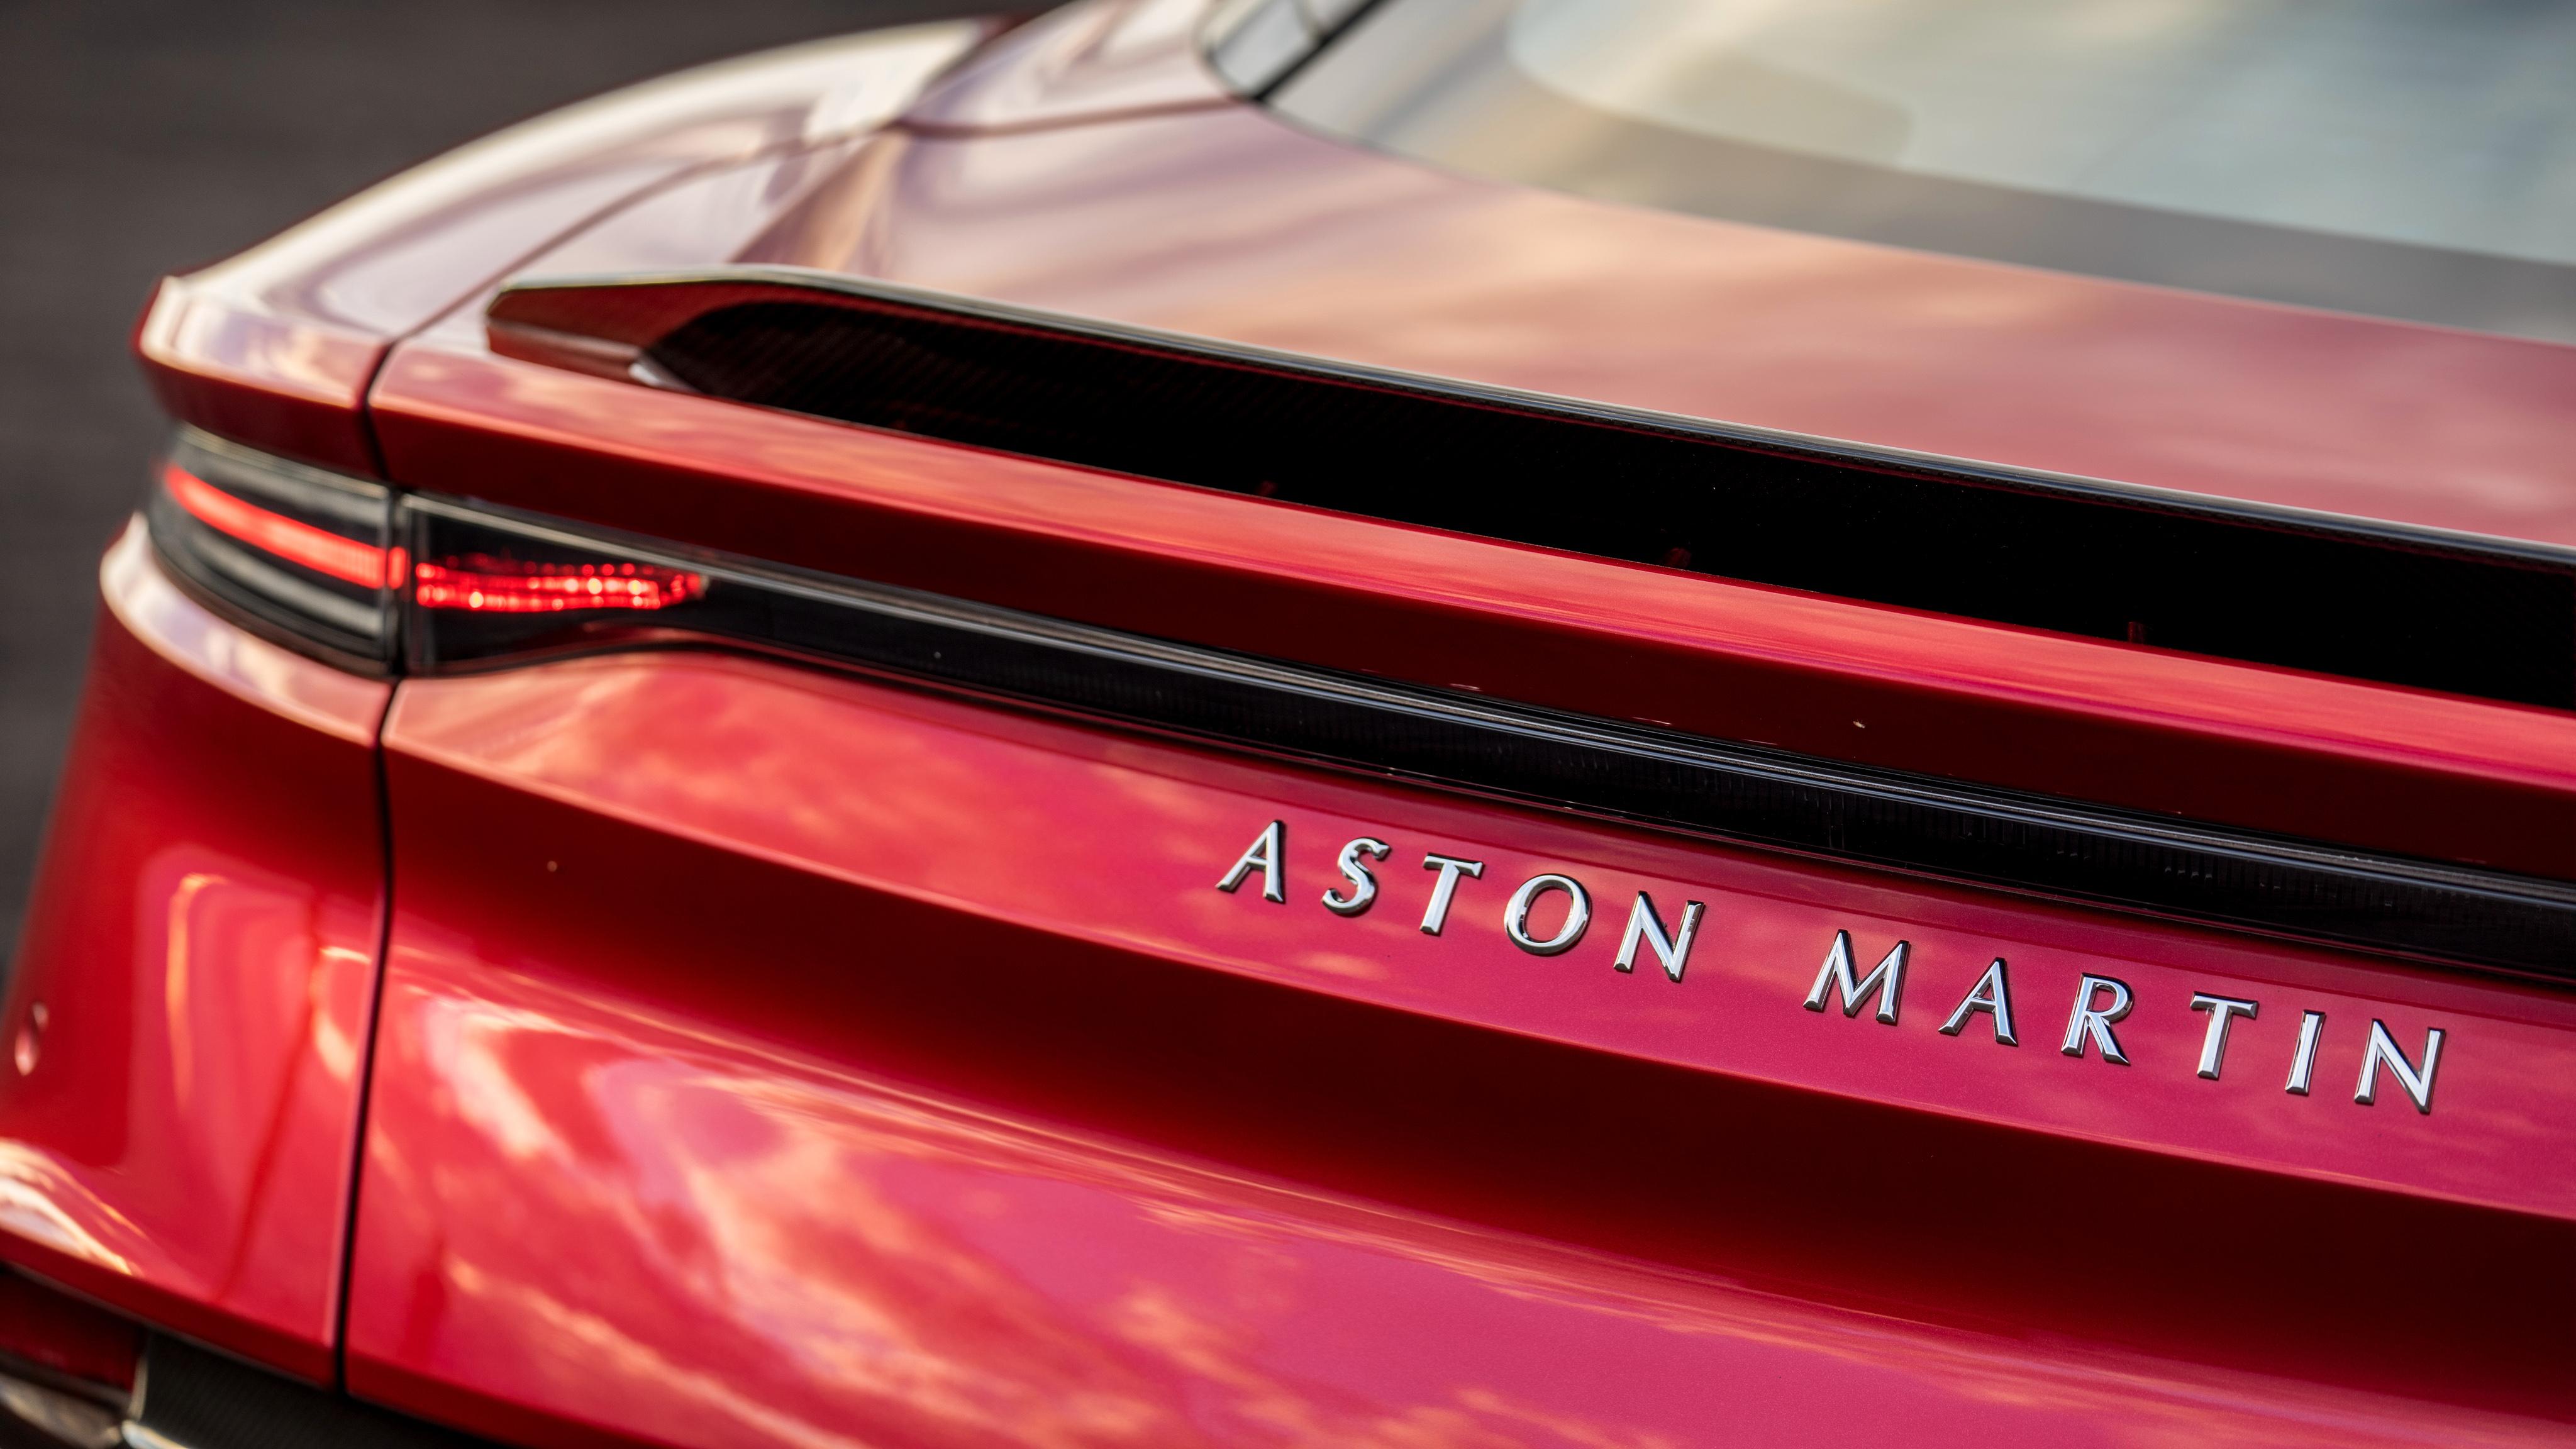 Aston Martin Dbs Superleggera 2018 4k 2 Wallpaper Hd Car